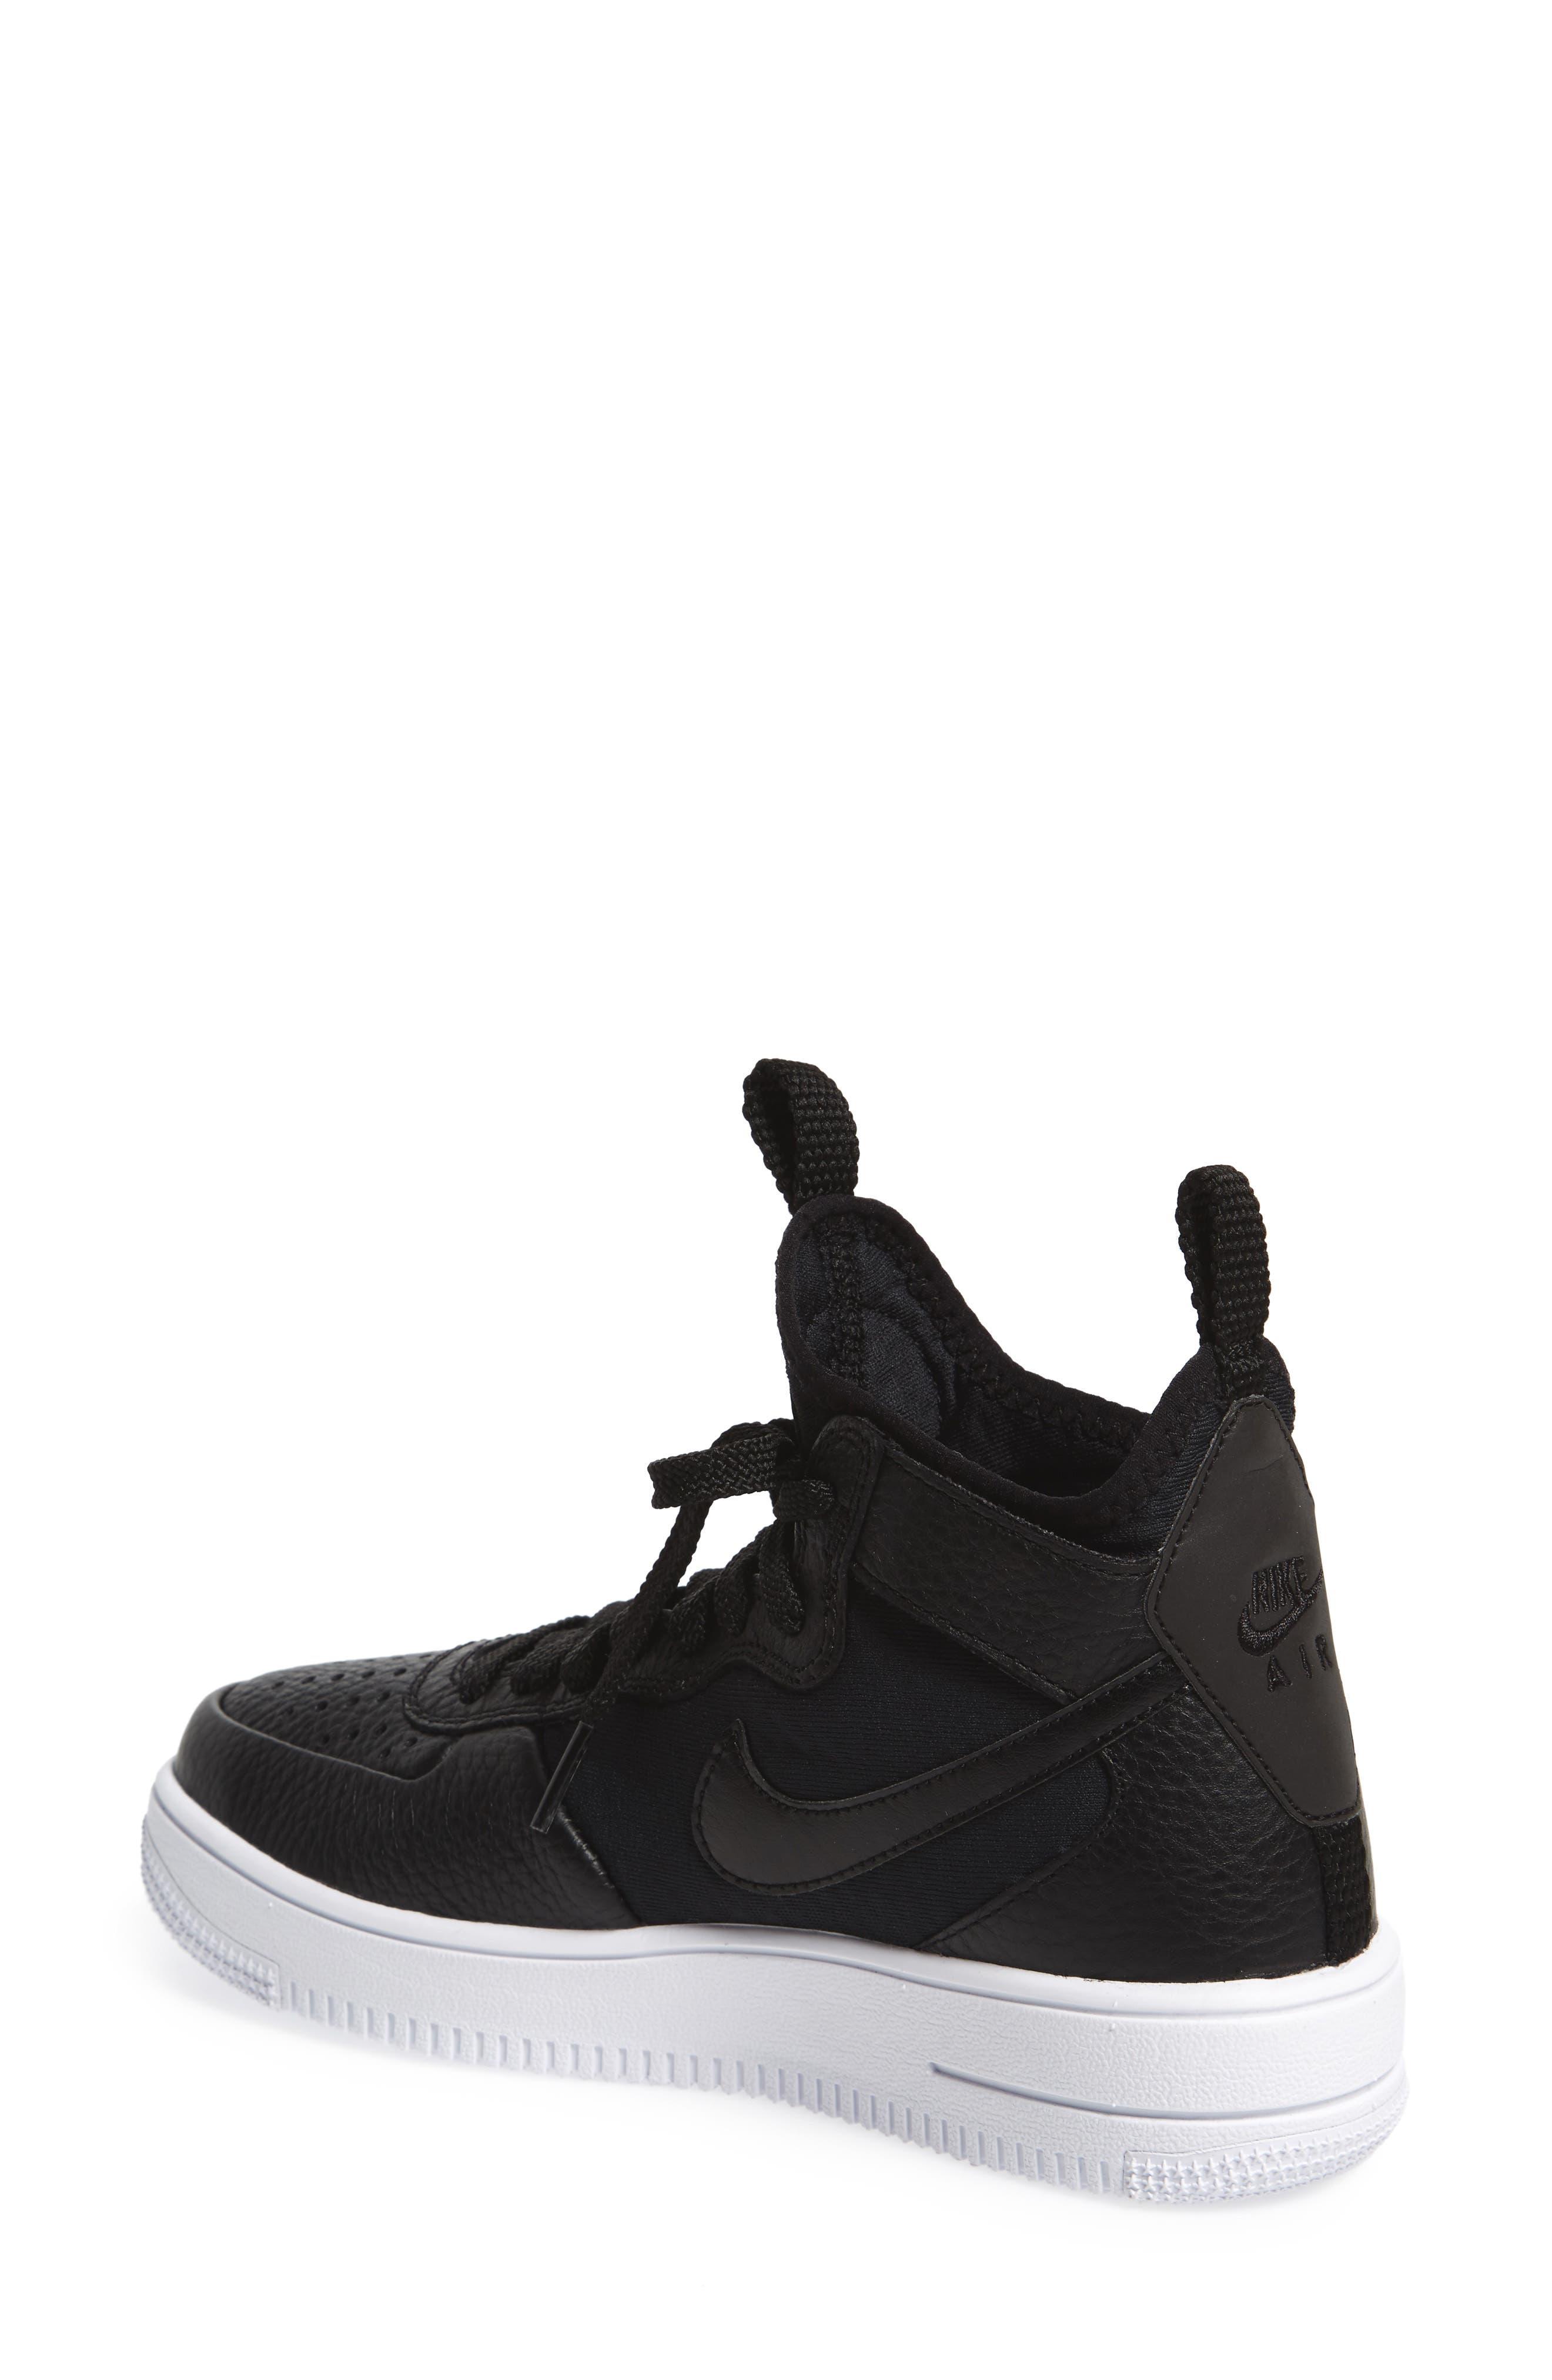 Air Force 1 Ultraforce Mid Sneaker,                             Alternate thumbnail 2, color,                             Black/ Black